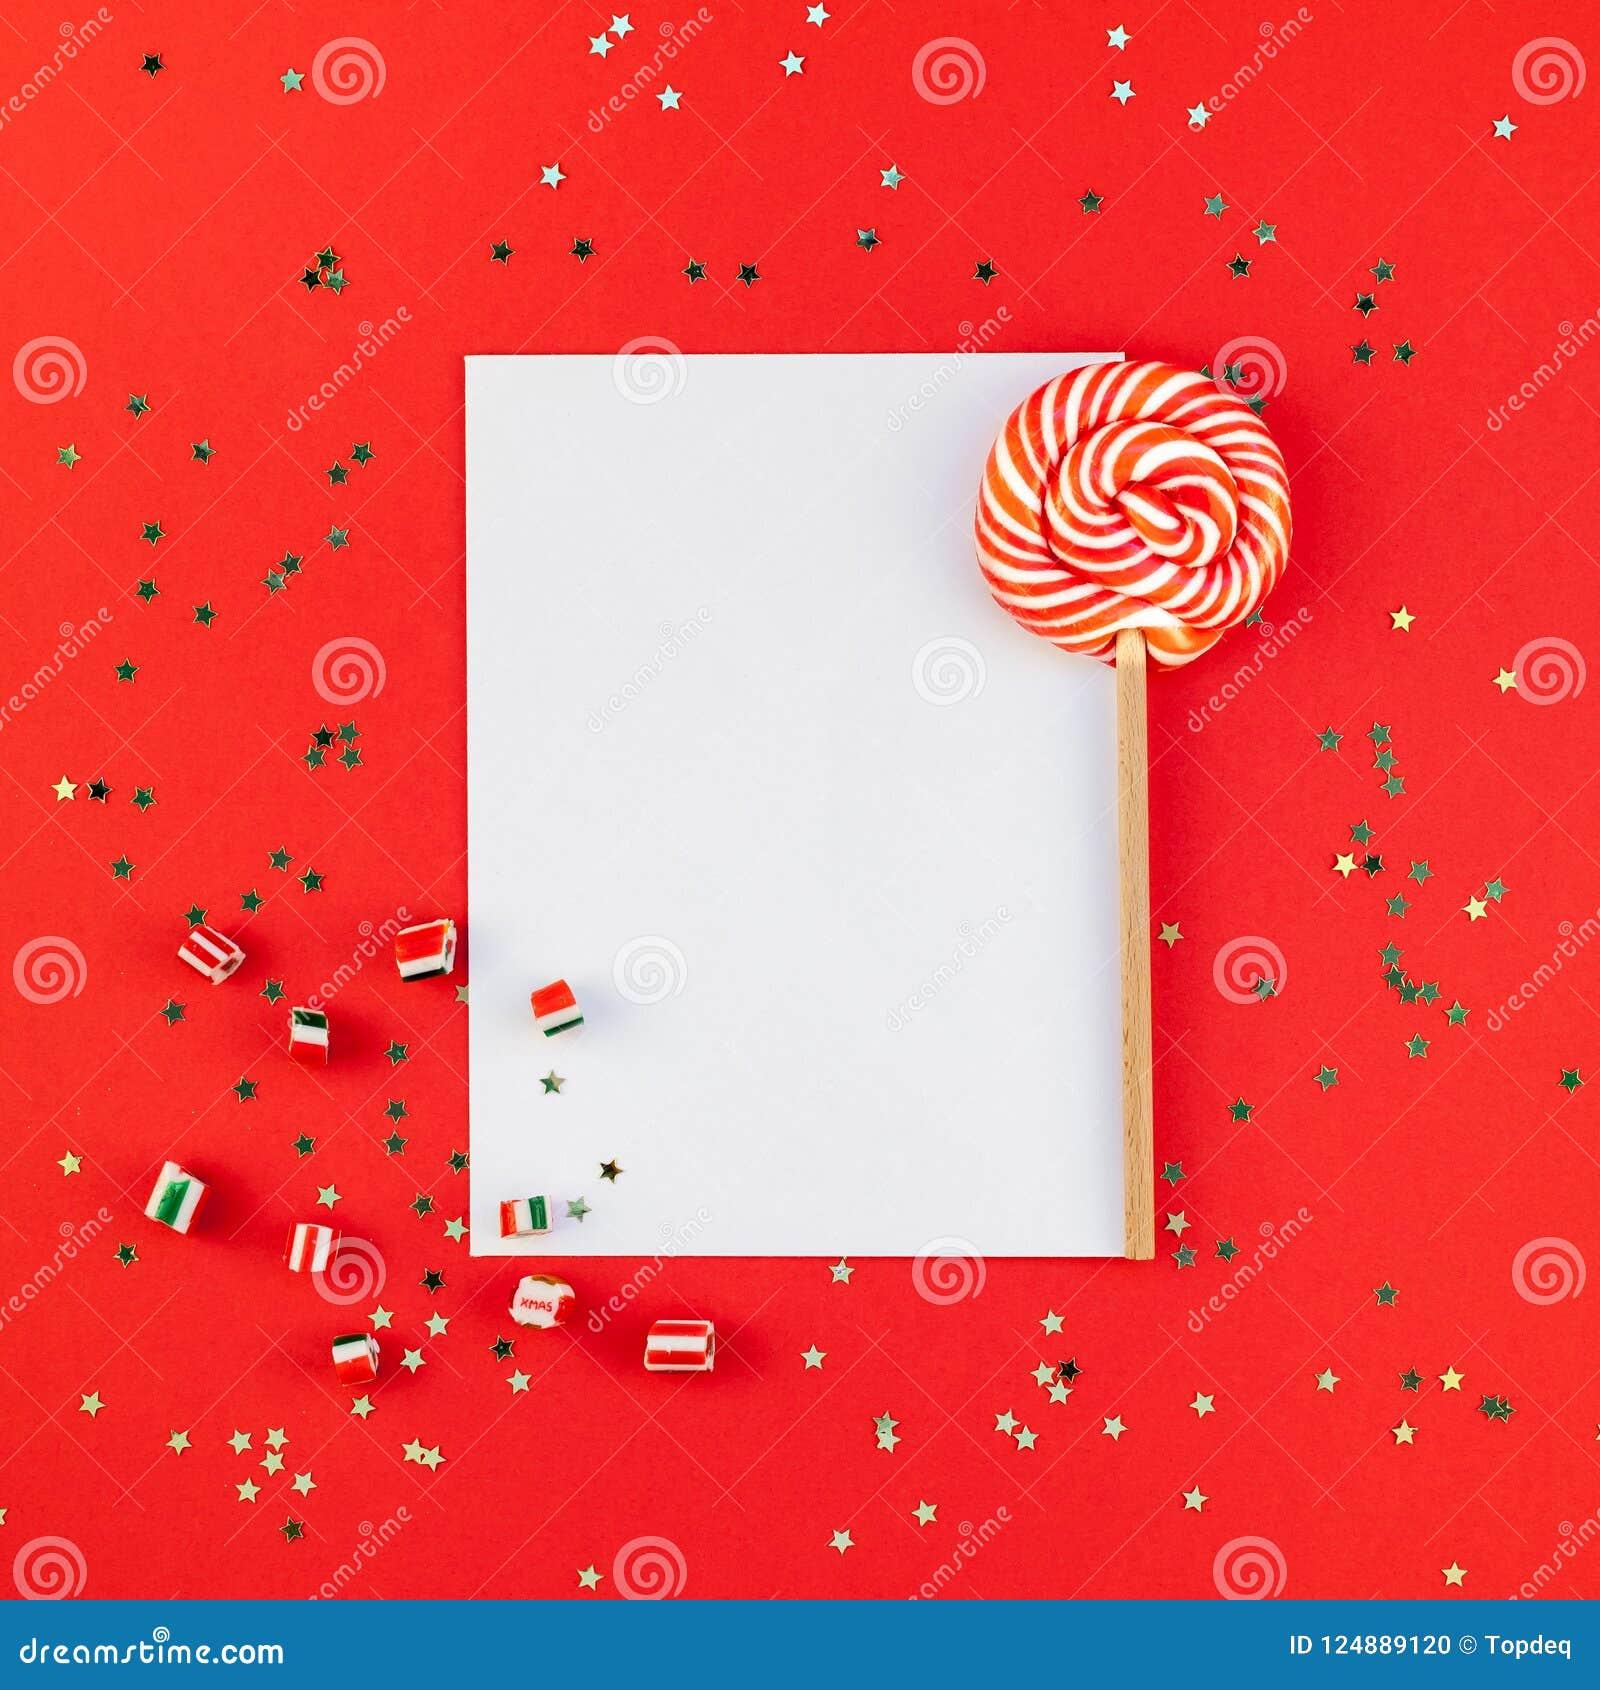 Christmas Greetings Letter.Christmas Greeting Postcard Mockup With Glitter Stock Photo